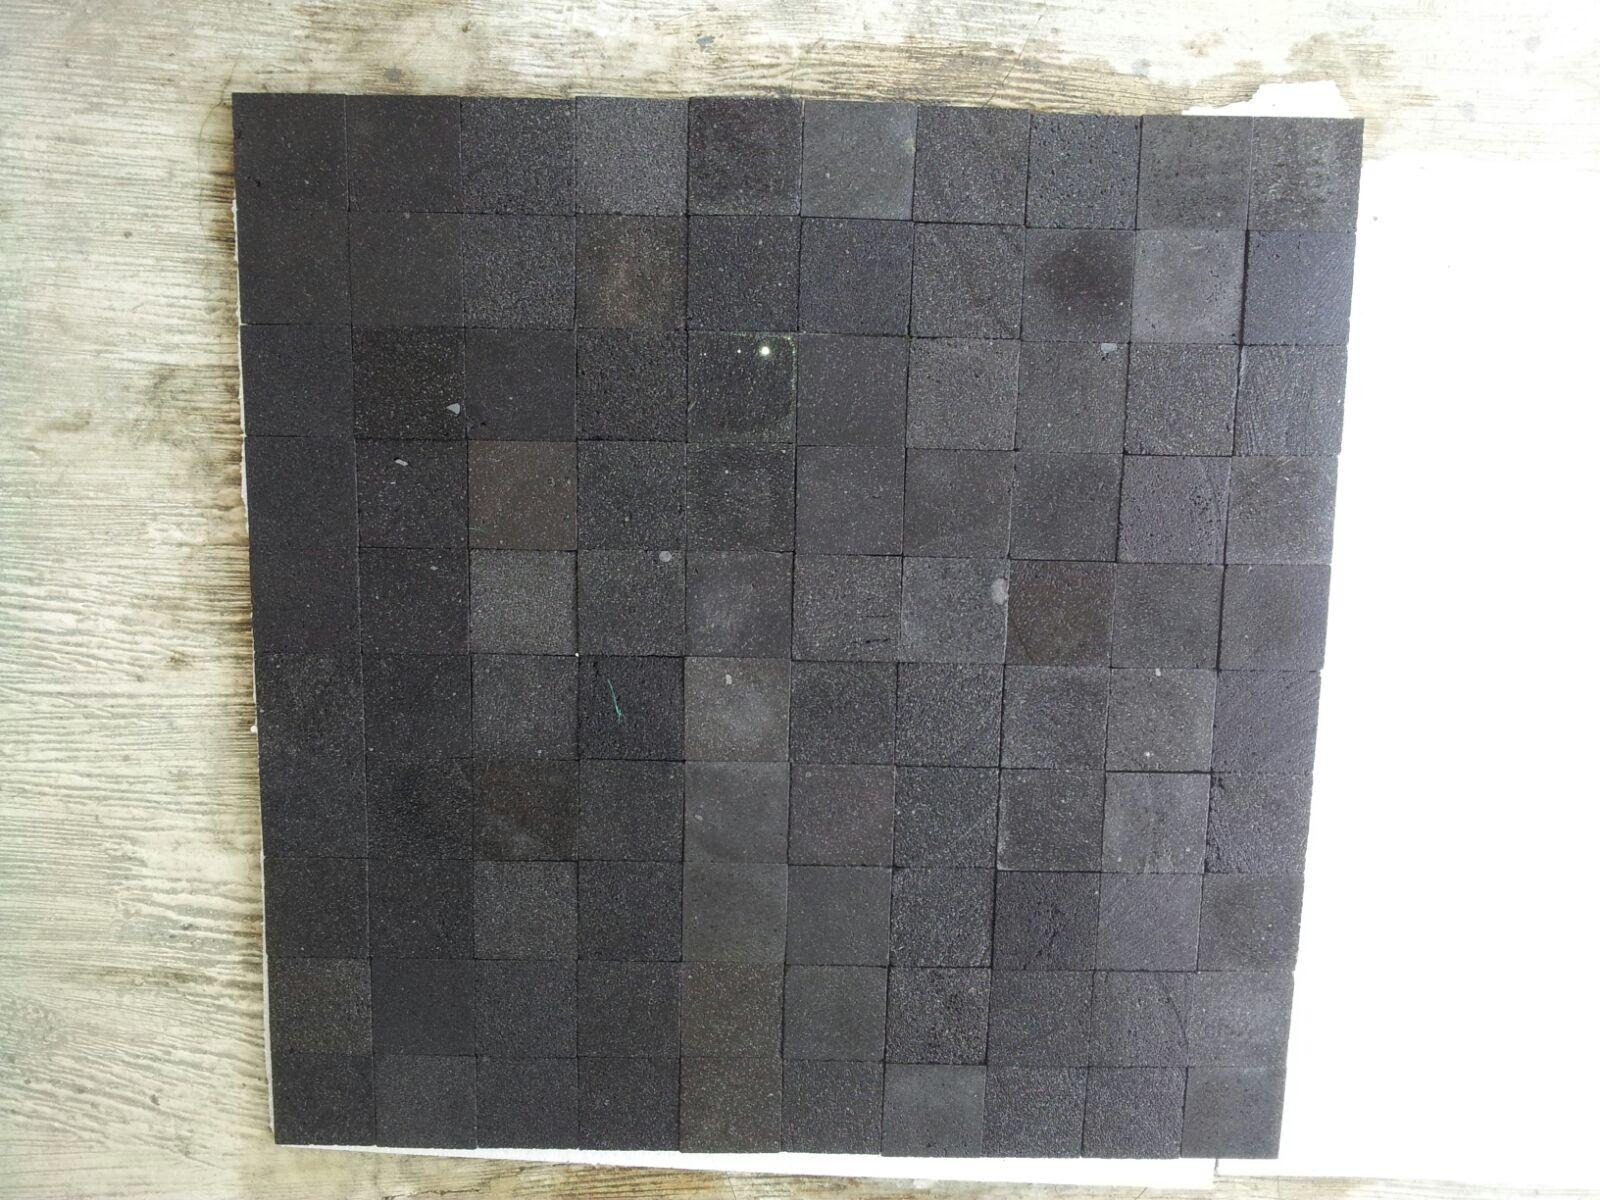 Black Lavastone Tiles Pool Coping